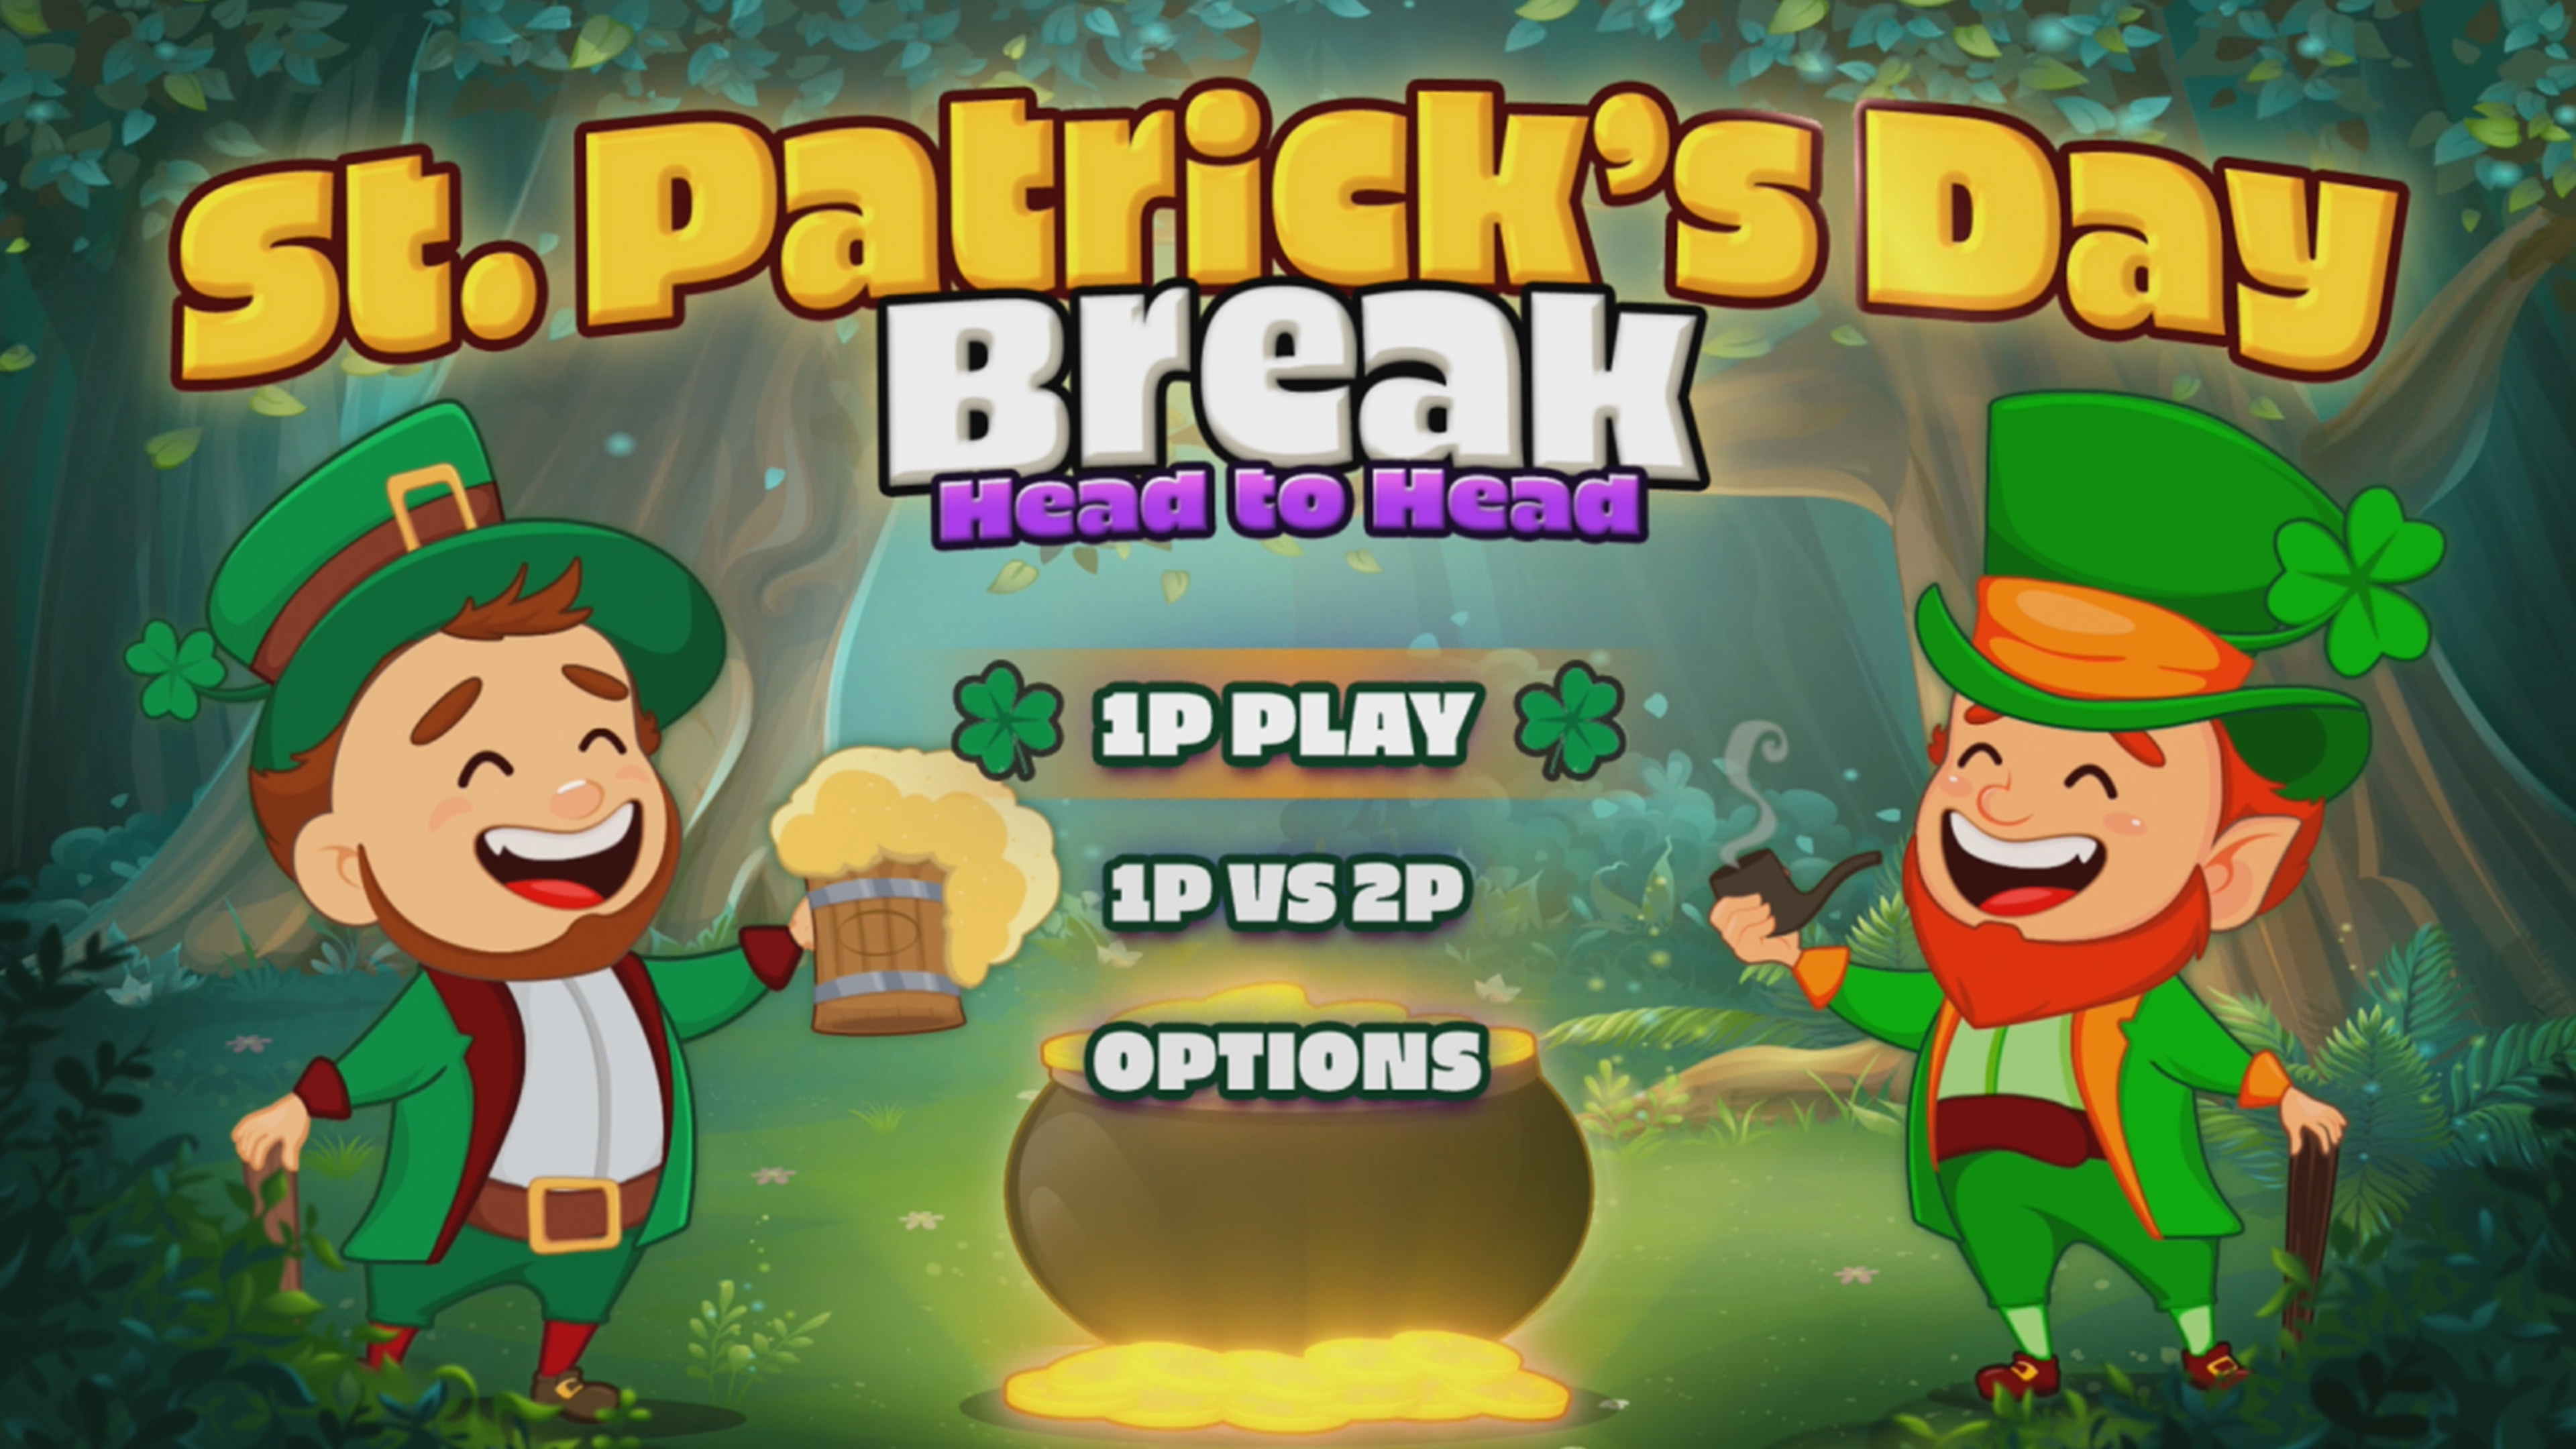 Avatar Full Game Bundle Saint Patricks Day Break Head To Head